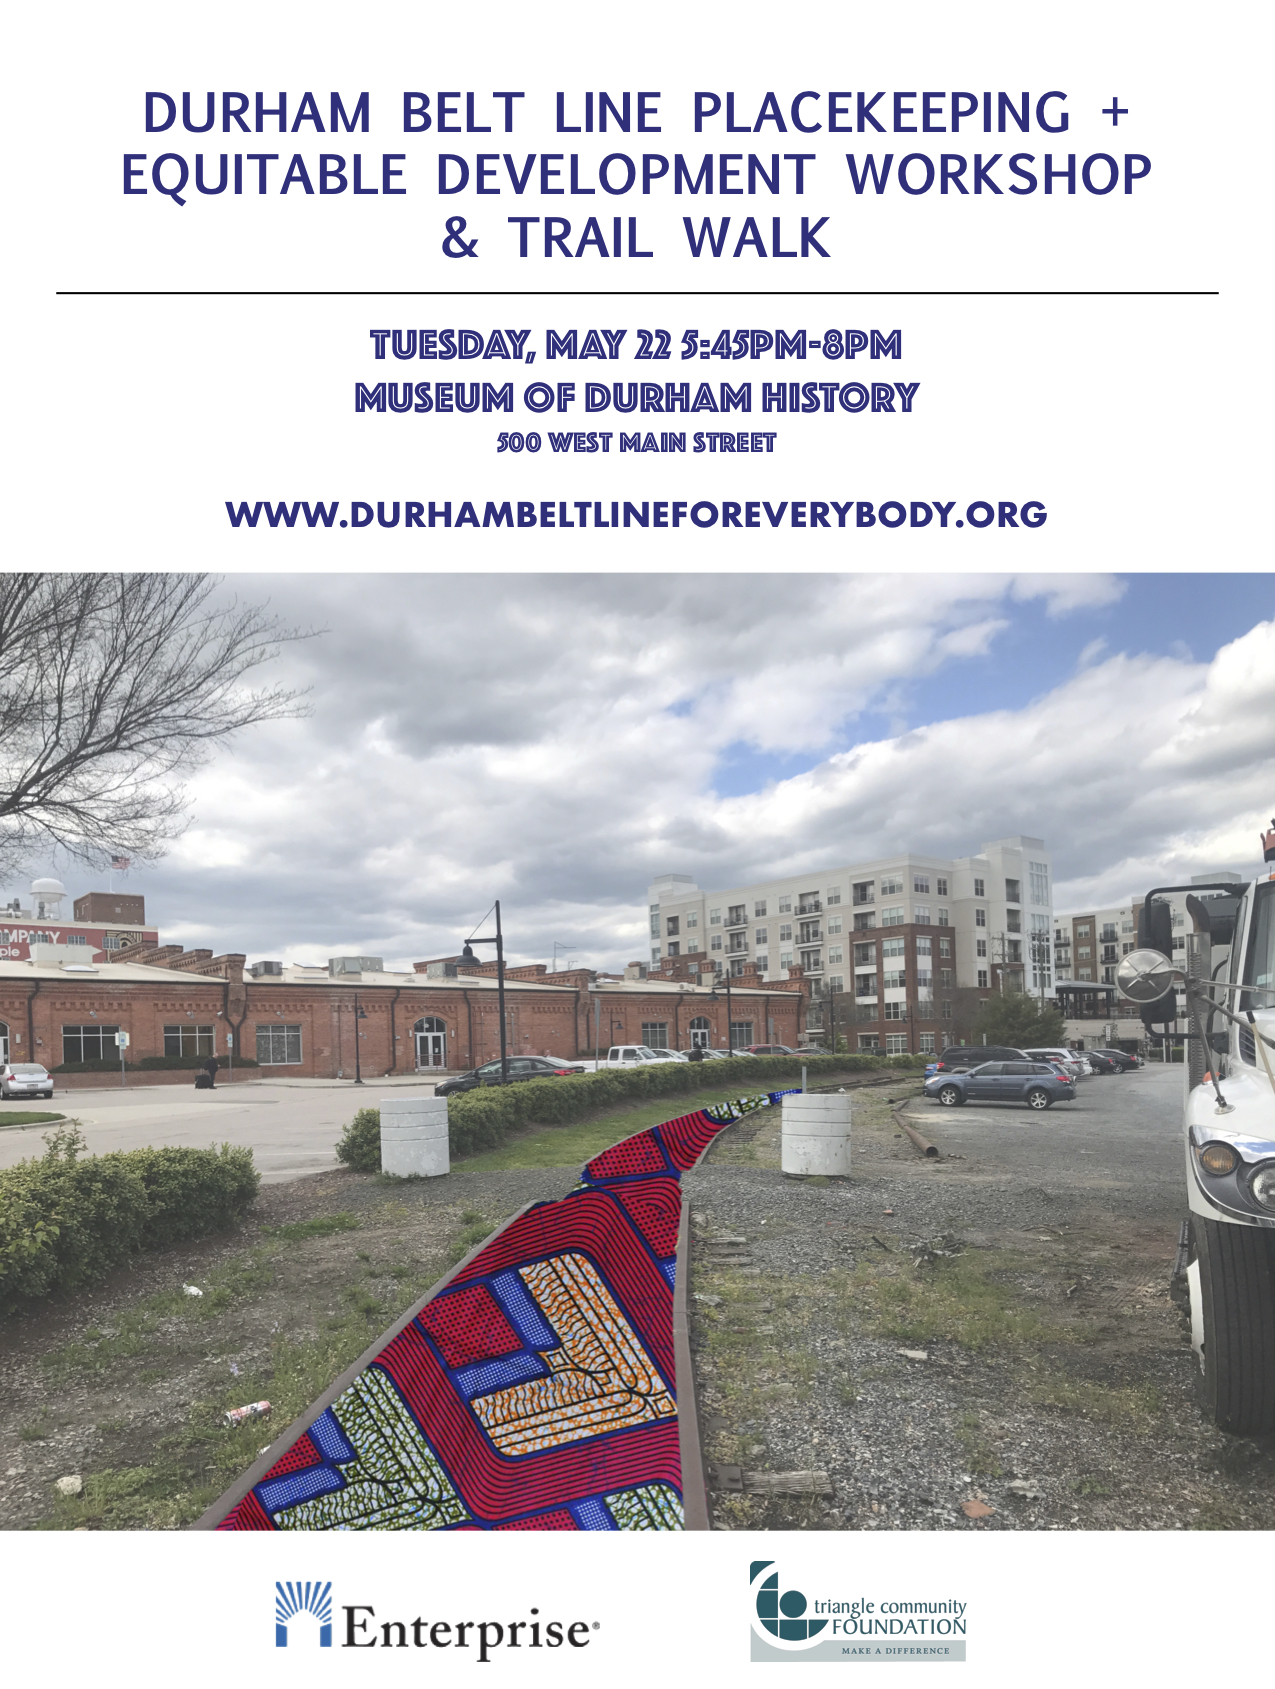 Durham Belt Line May 22 Workshop Flyer.jpg